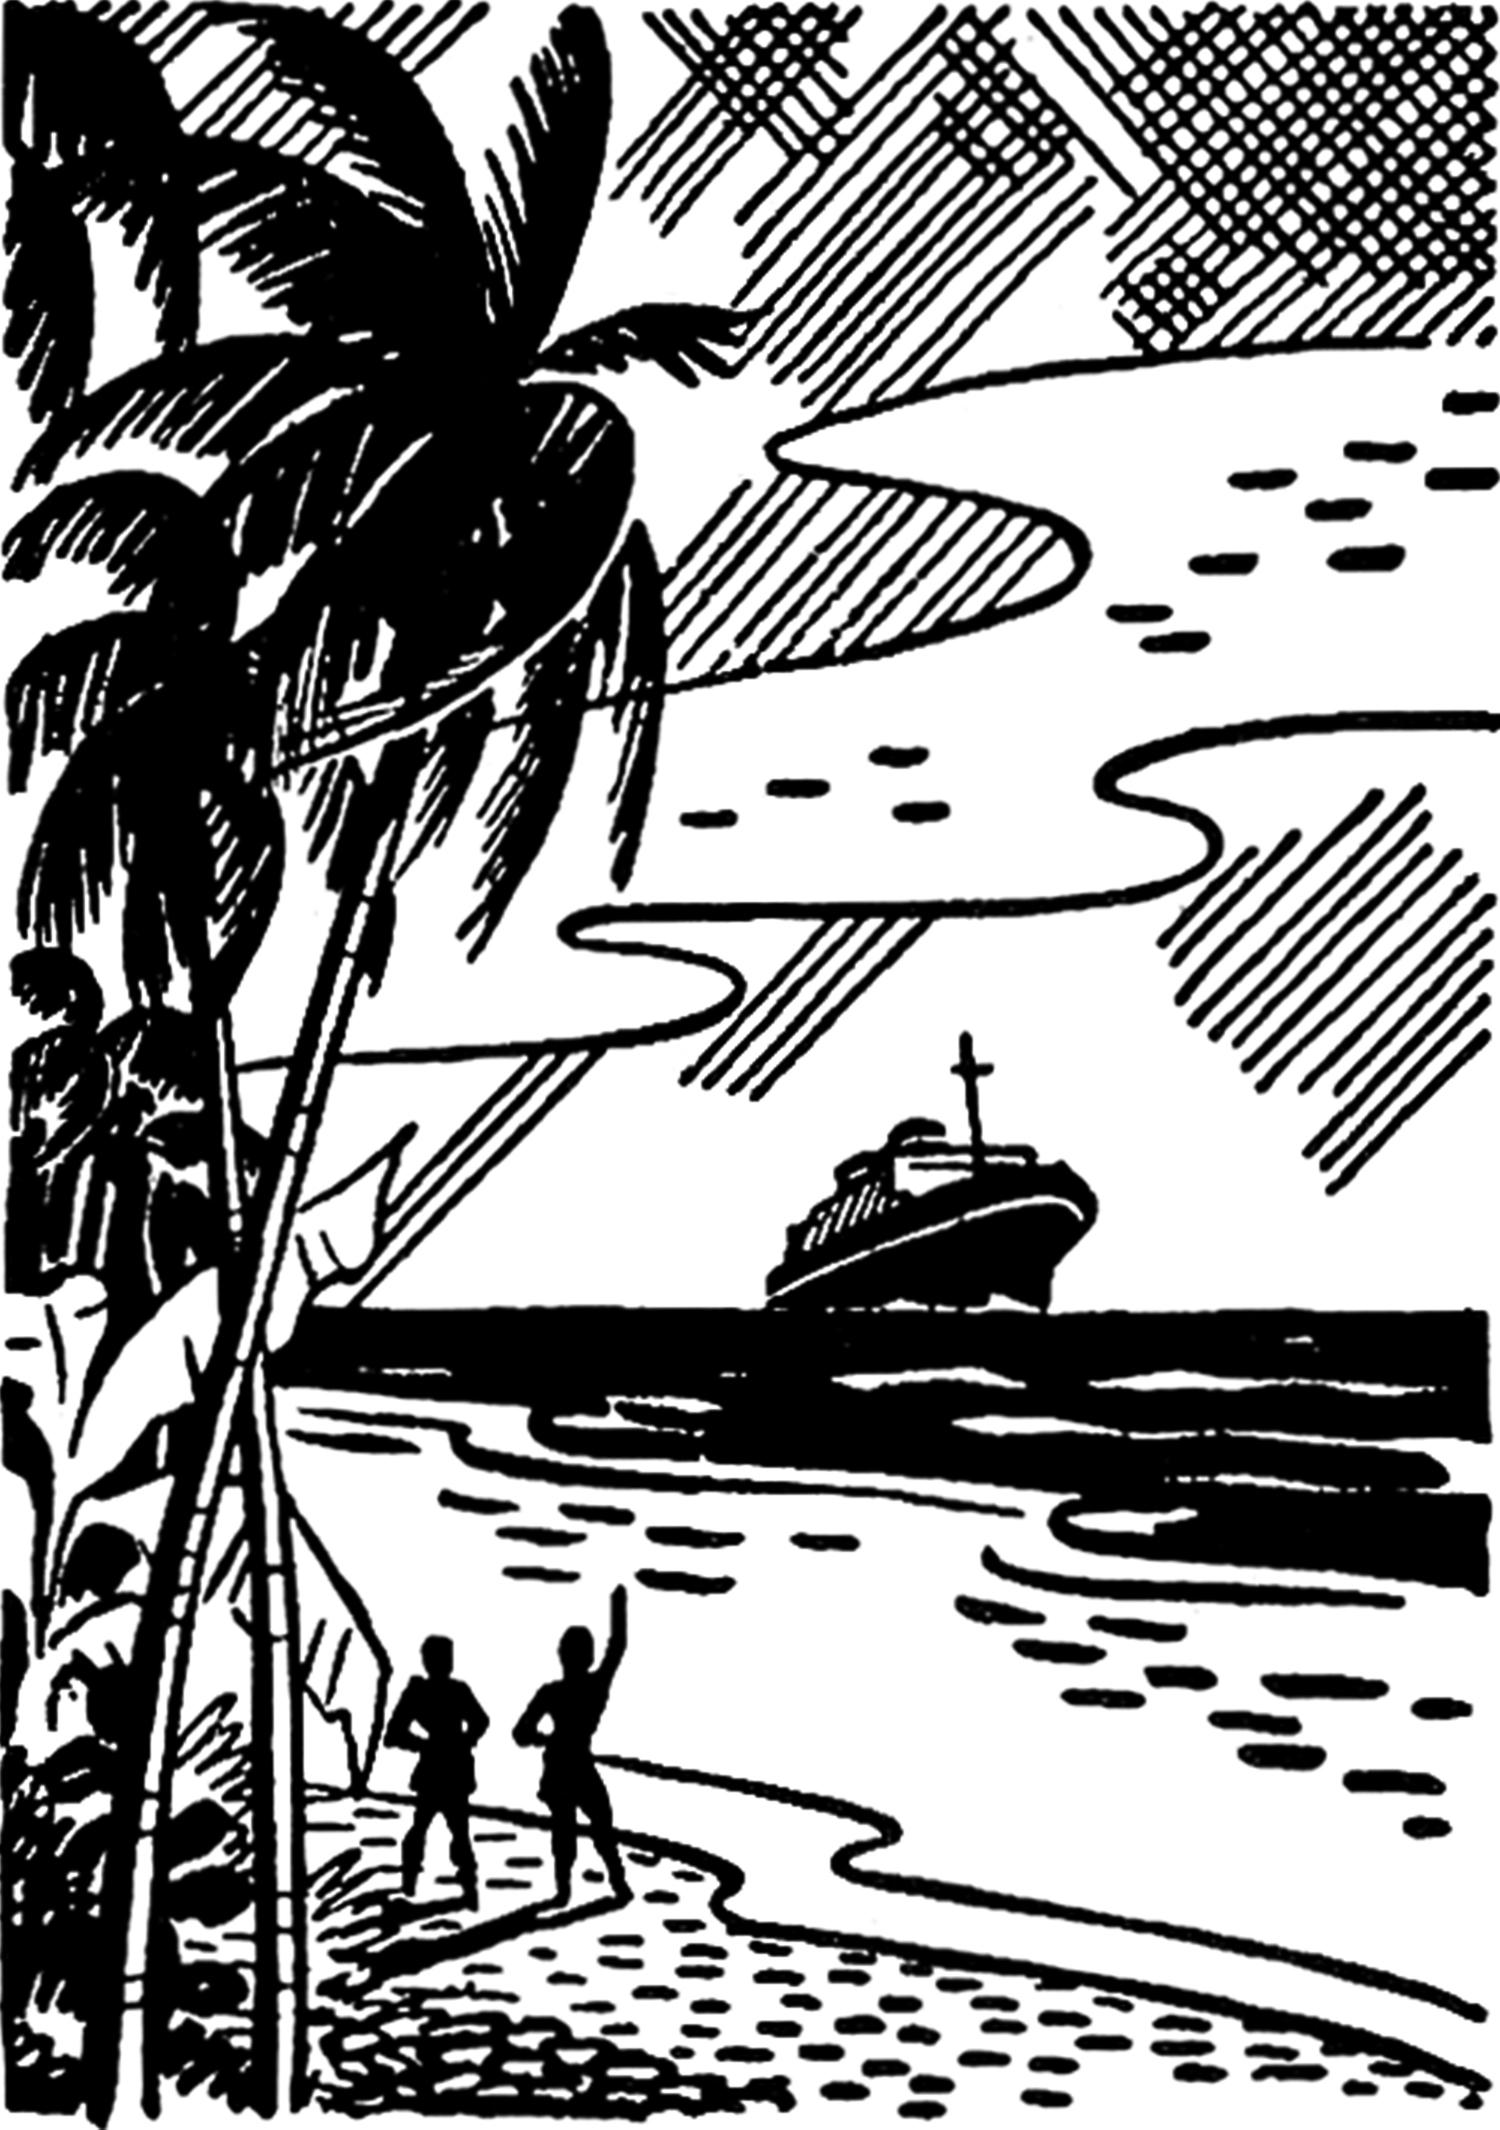 Retro summer images beach cruise sailboat